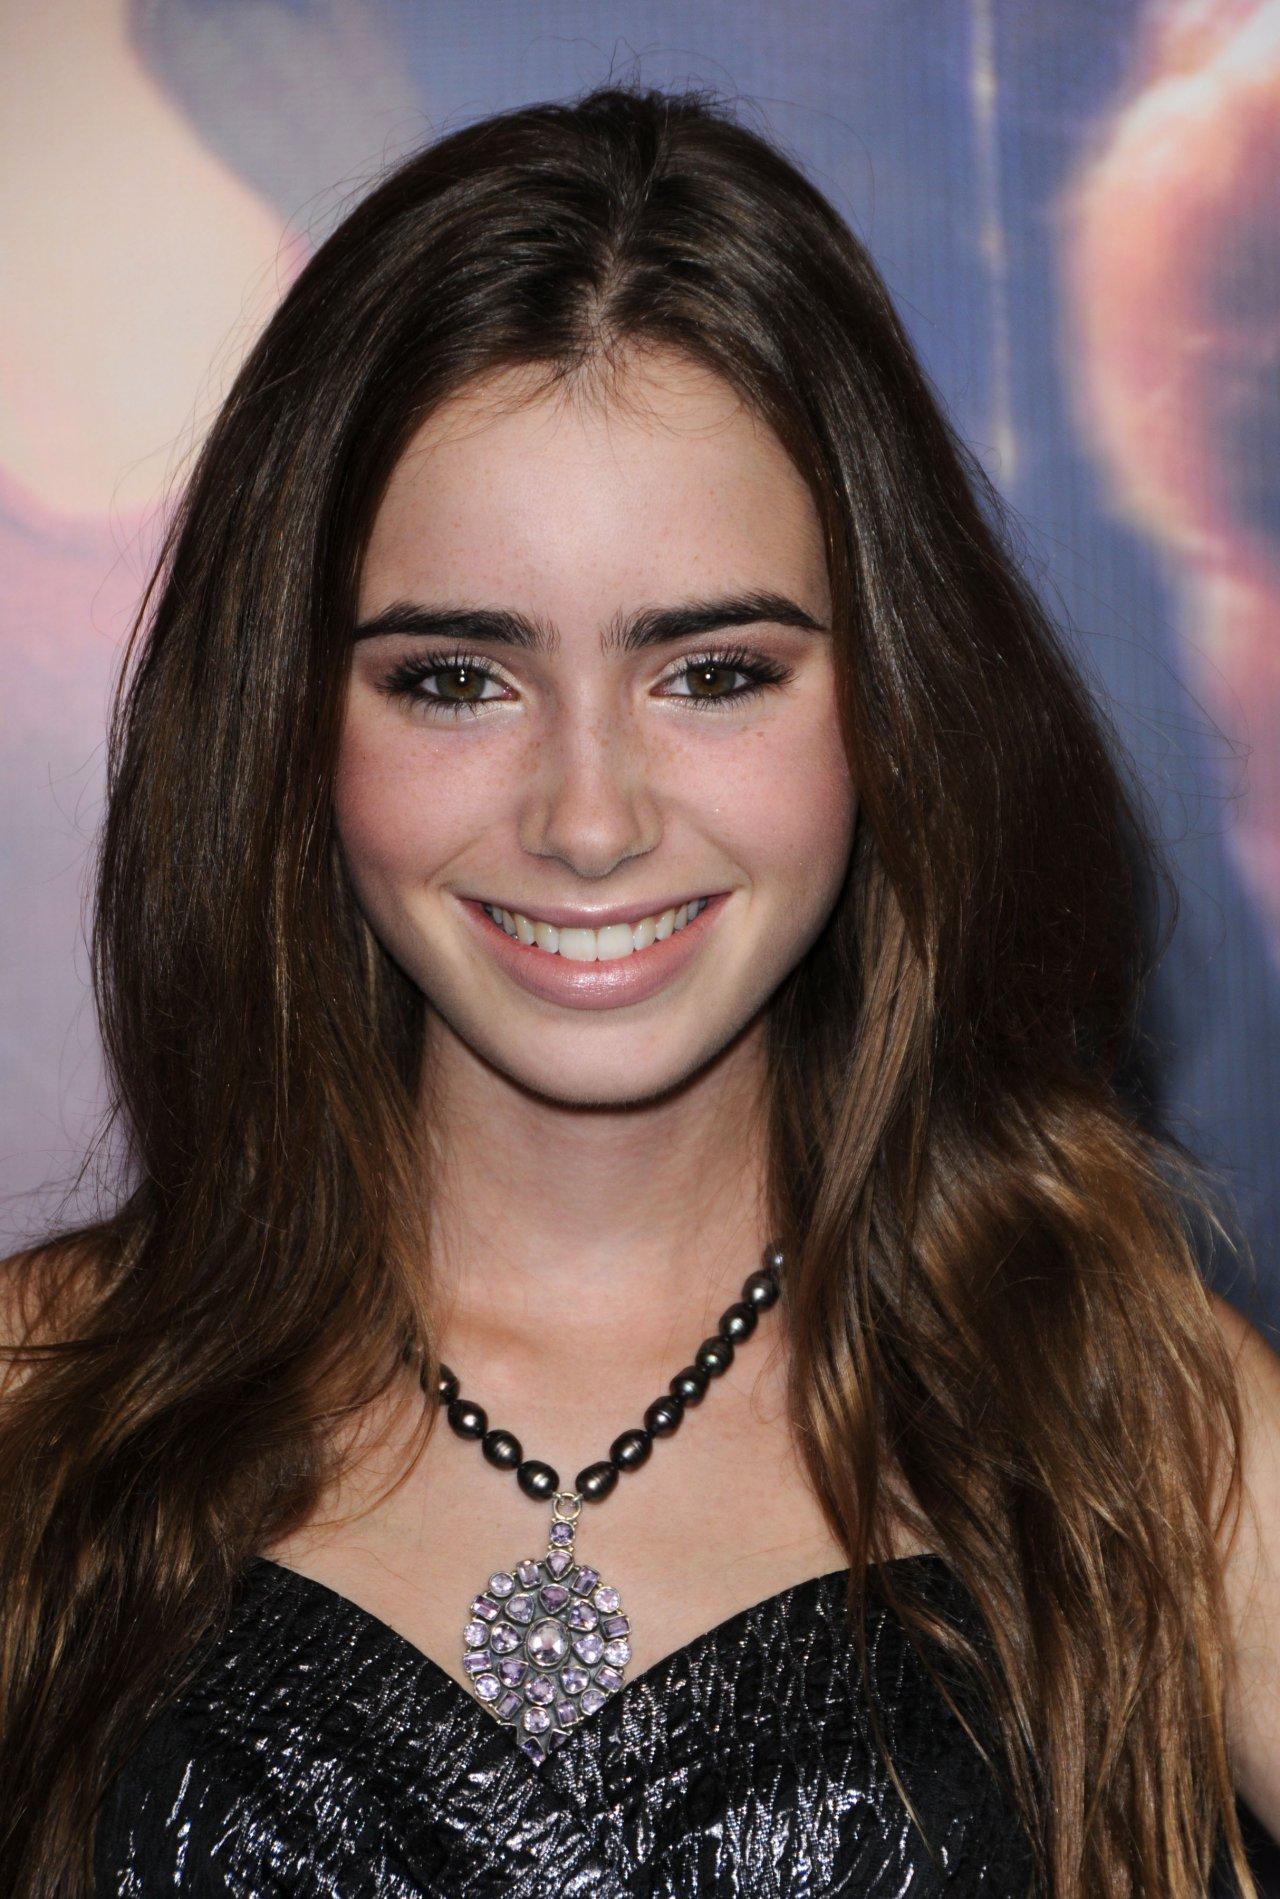 Lily Morett